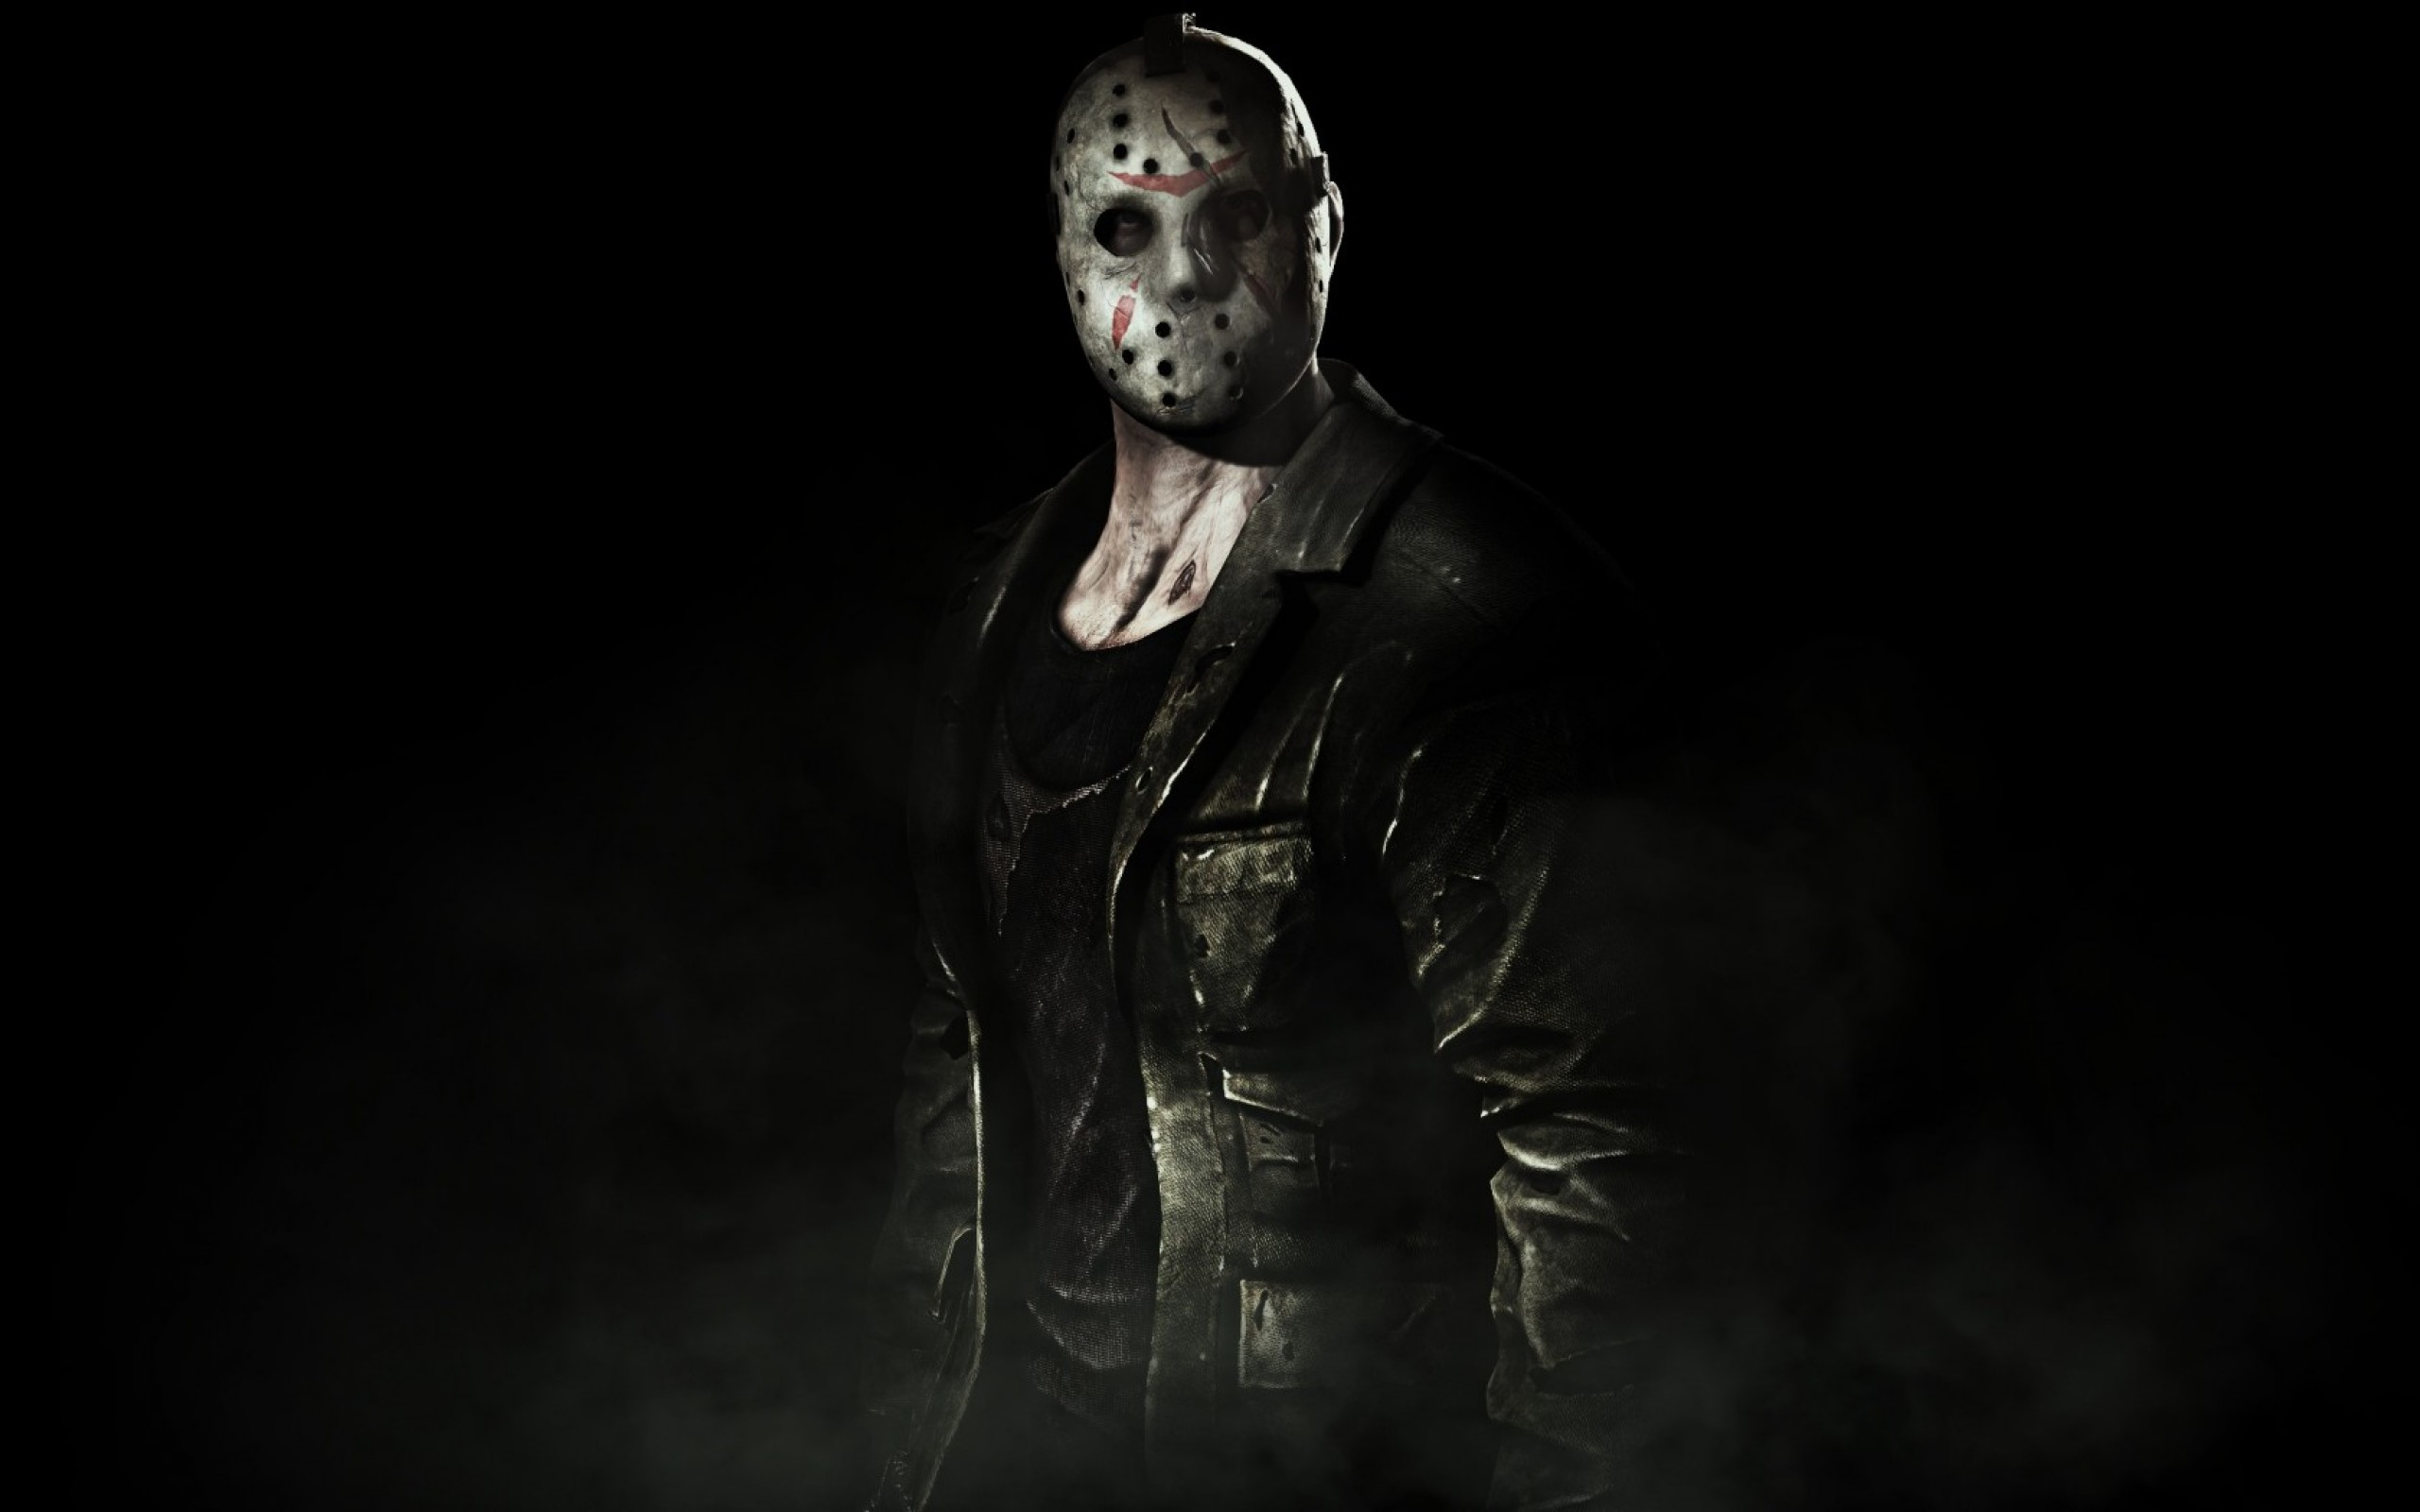 Mortal-Kombat-X-Scorpion-Game-Voorhins-Character-Mask-